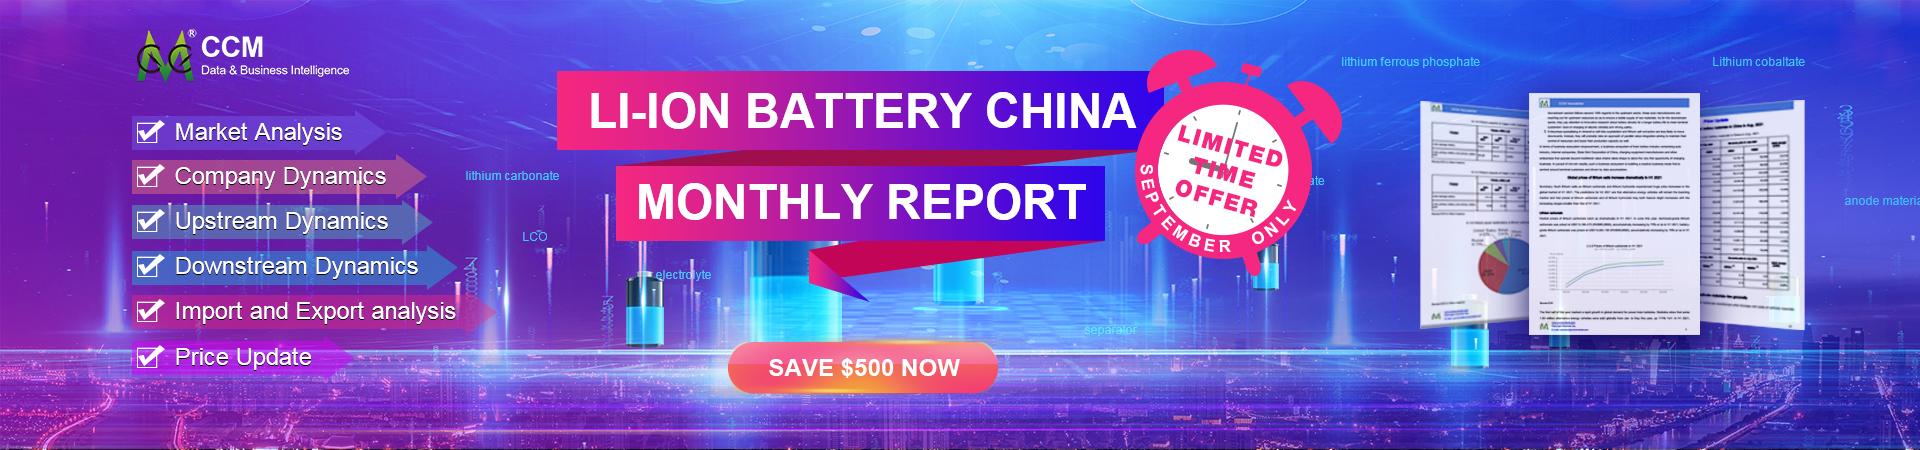 Li-ion battery newsletter